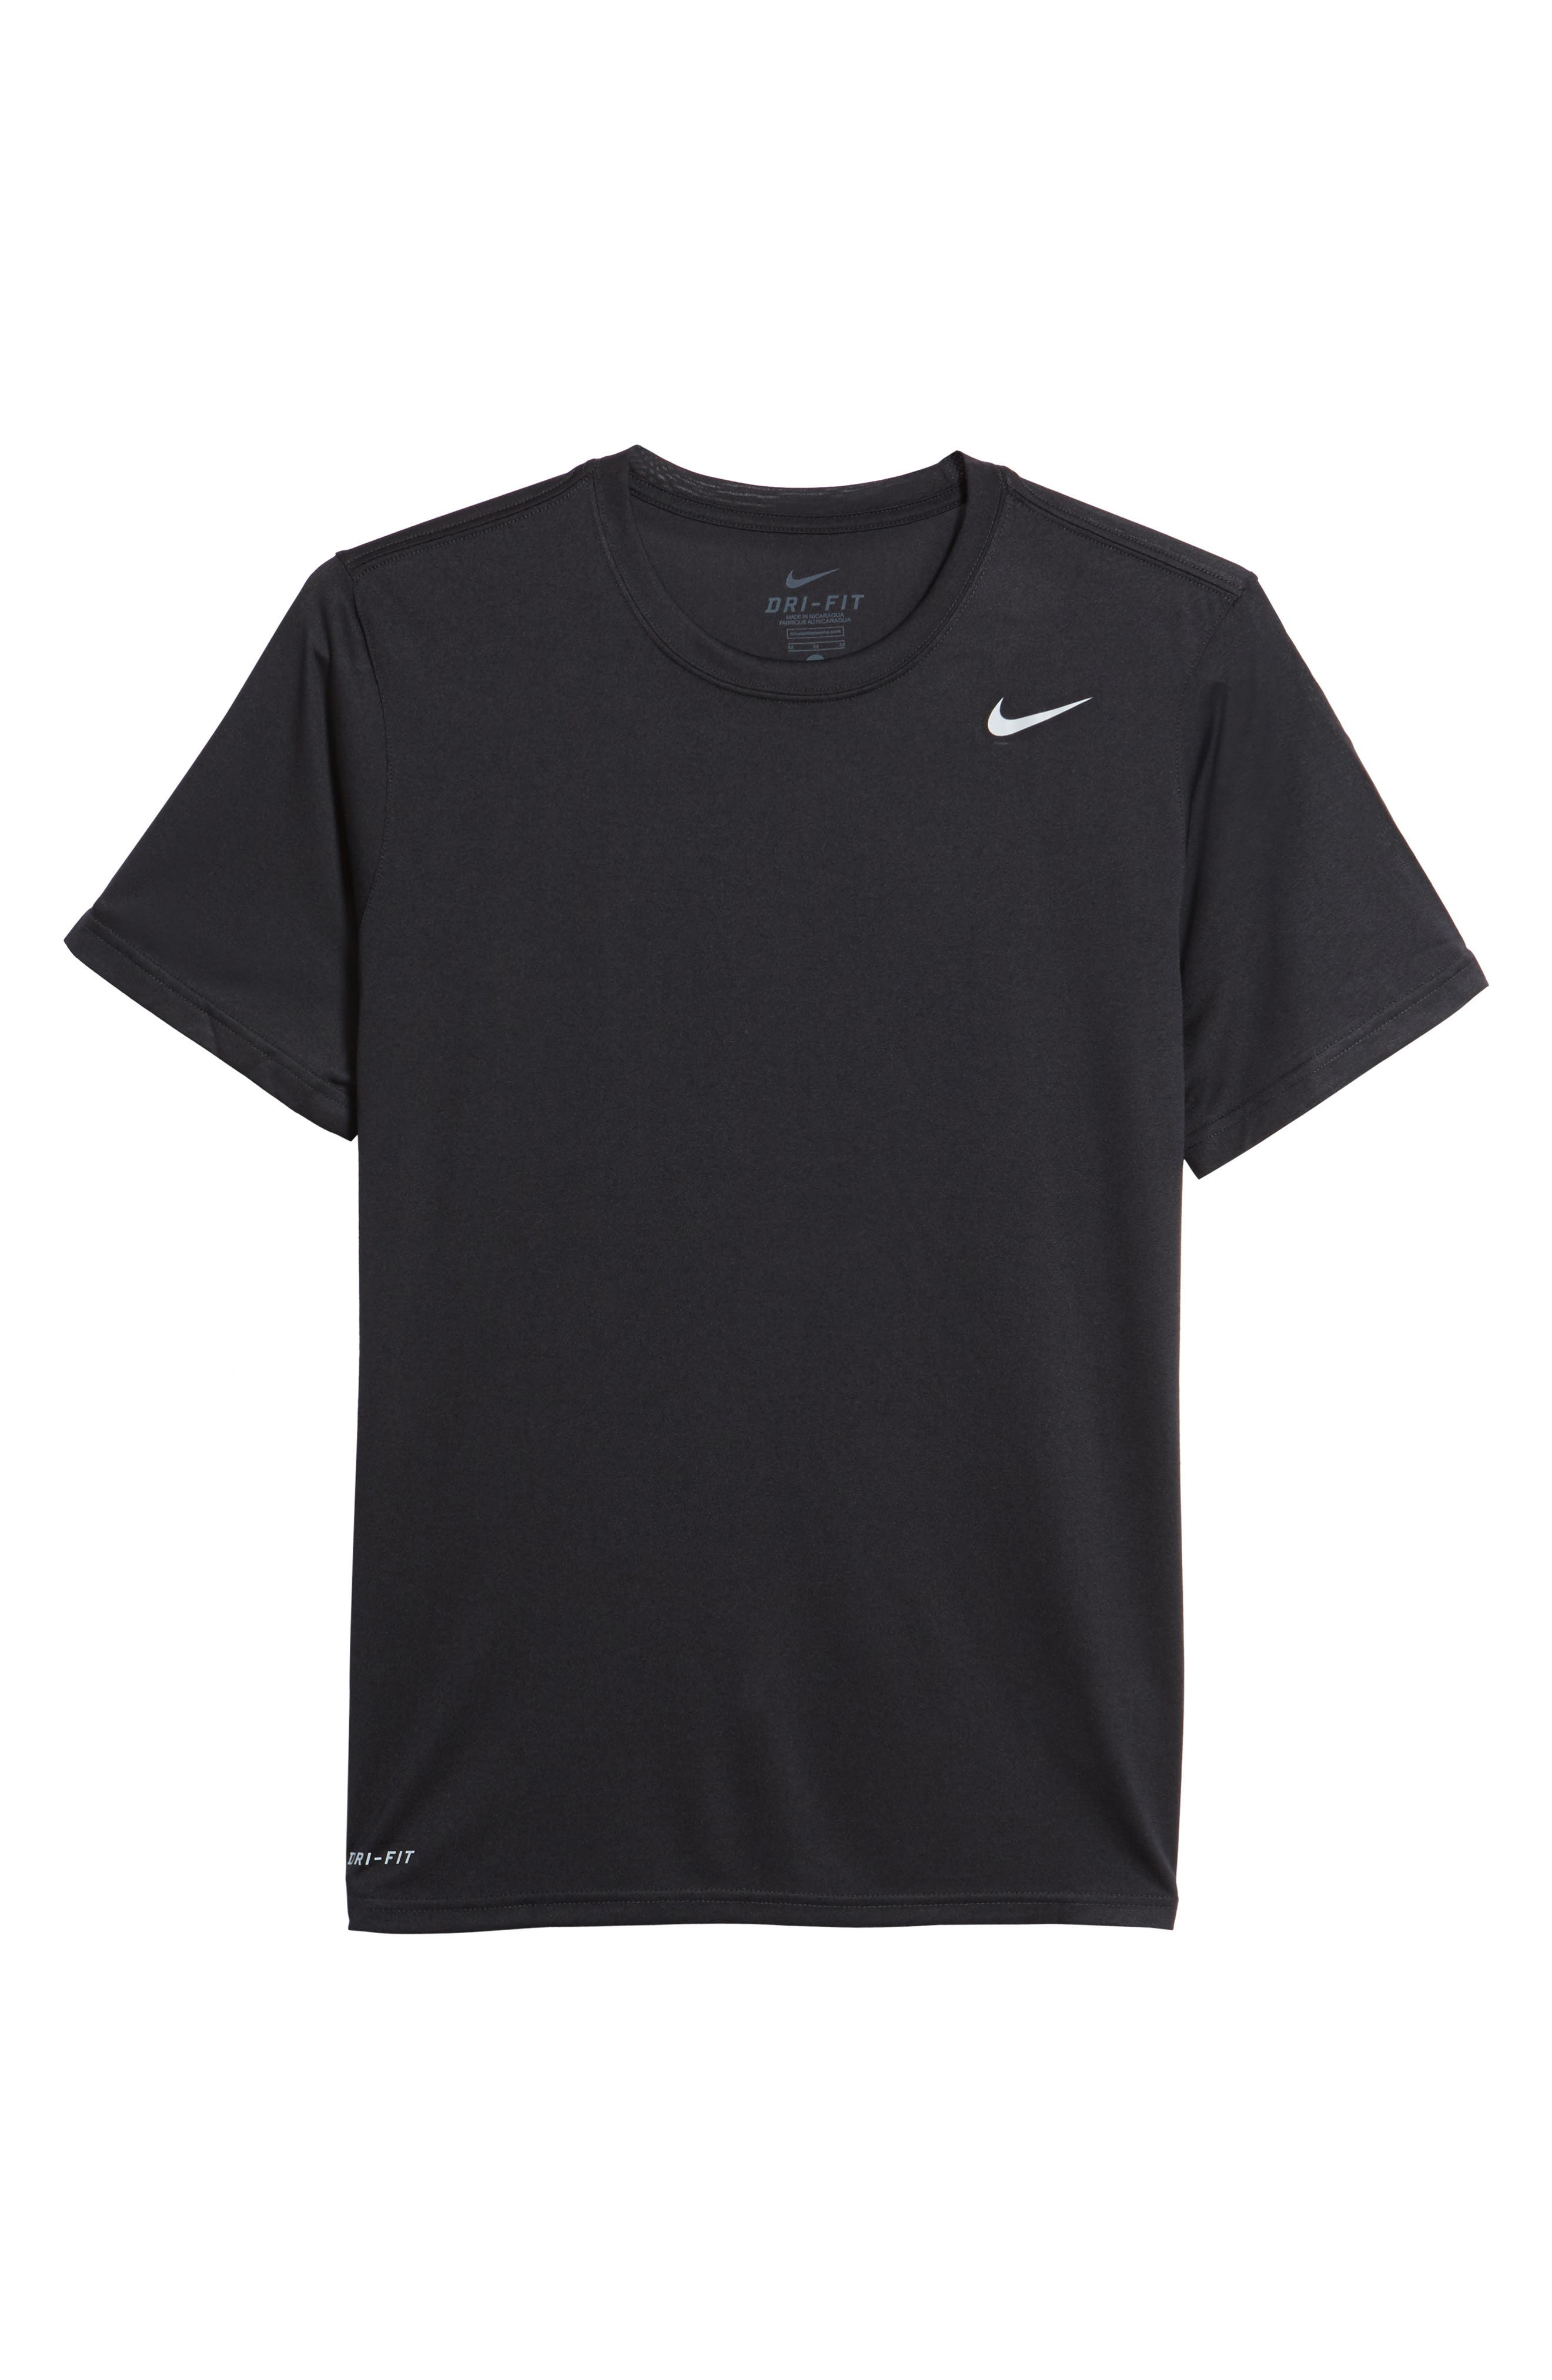 'Legend 2.0' Dri-FIT Training T-Shirt,                             Alternate thumbnail 5, color,                             Black/ Black/ Matte Silver